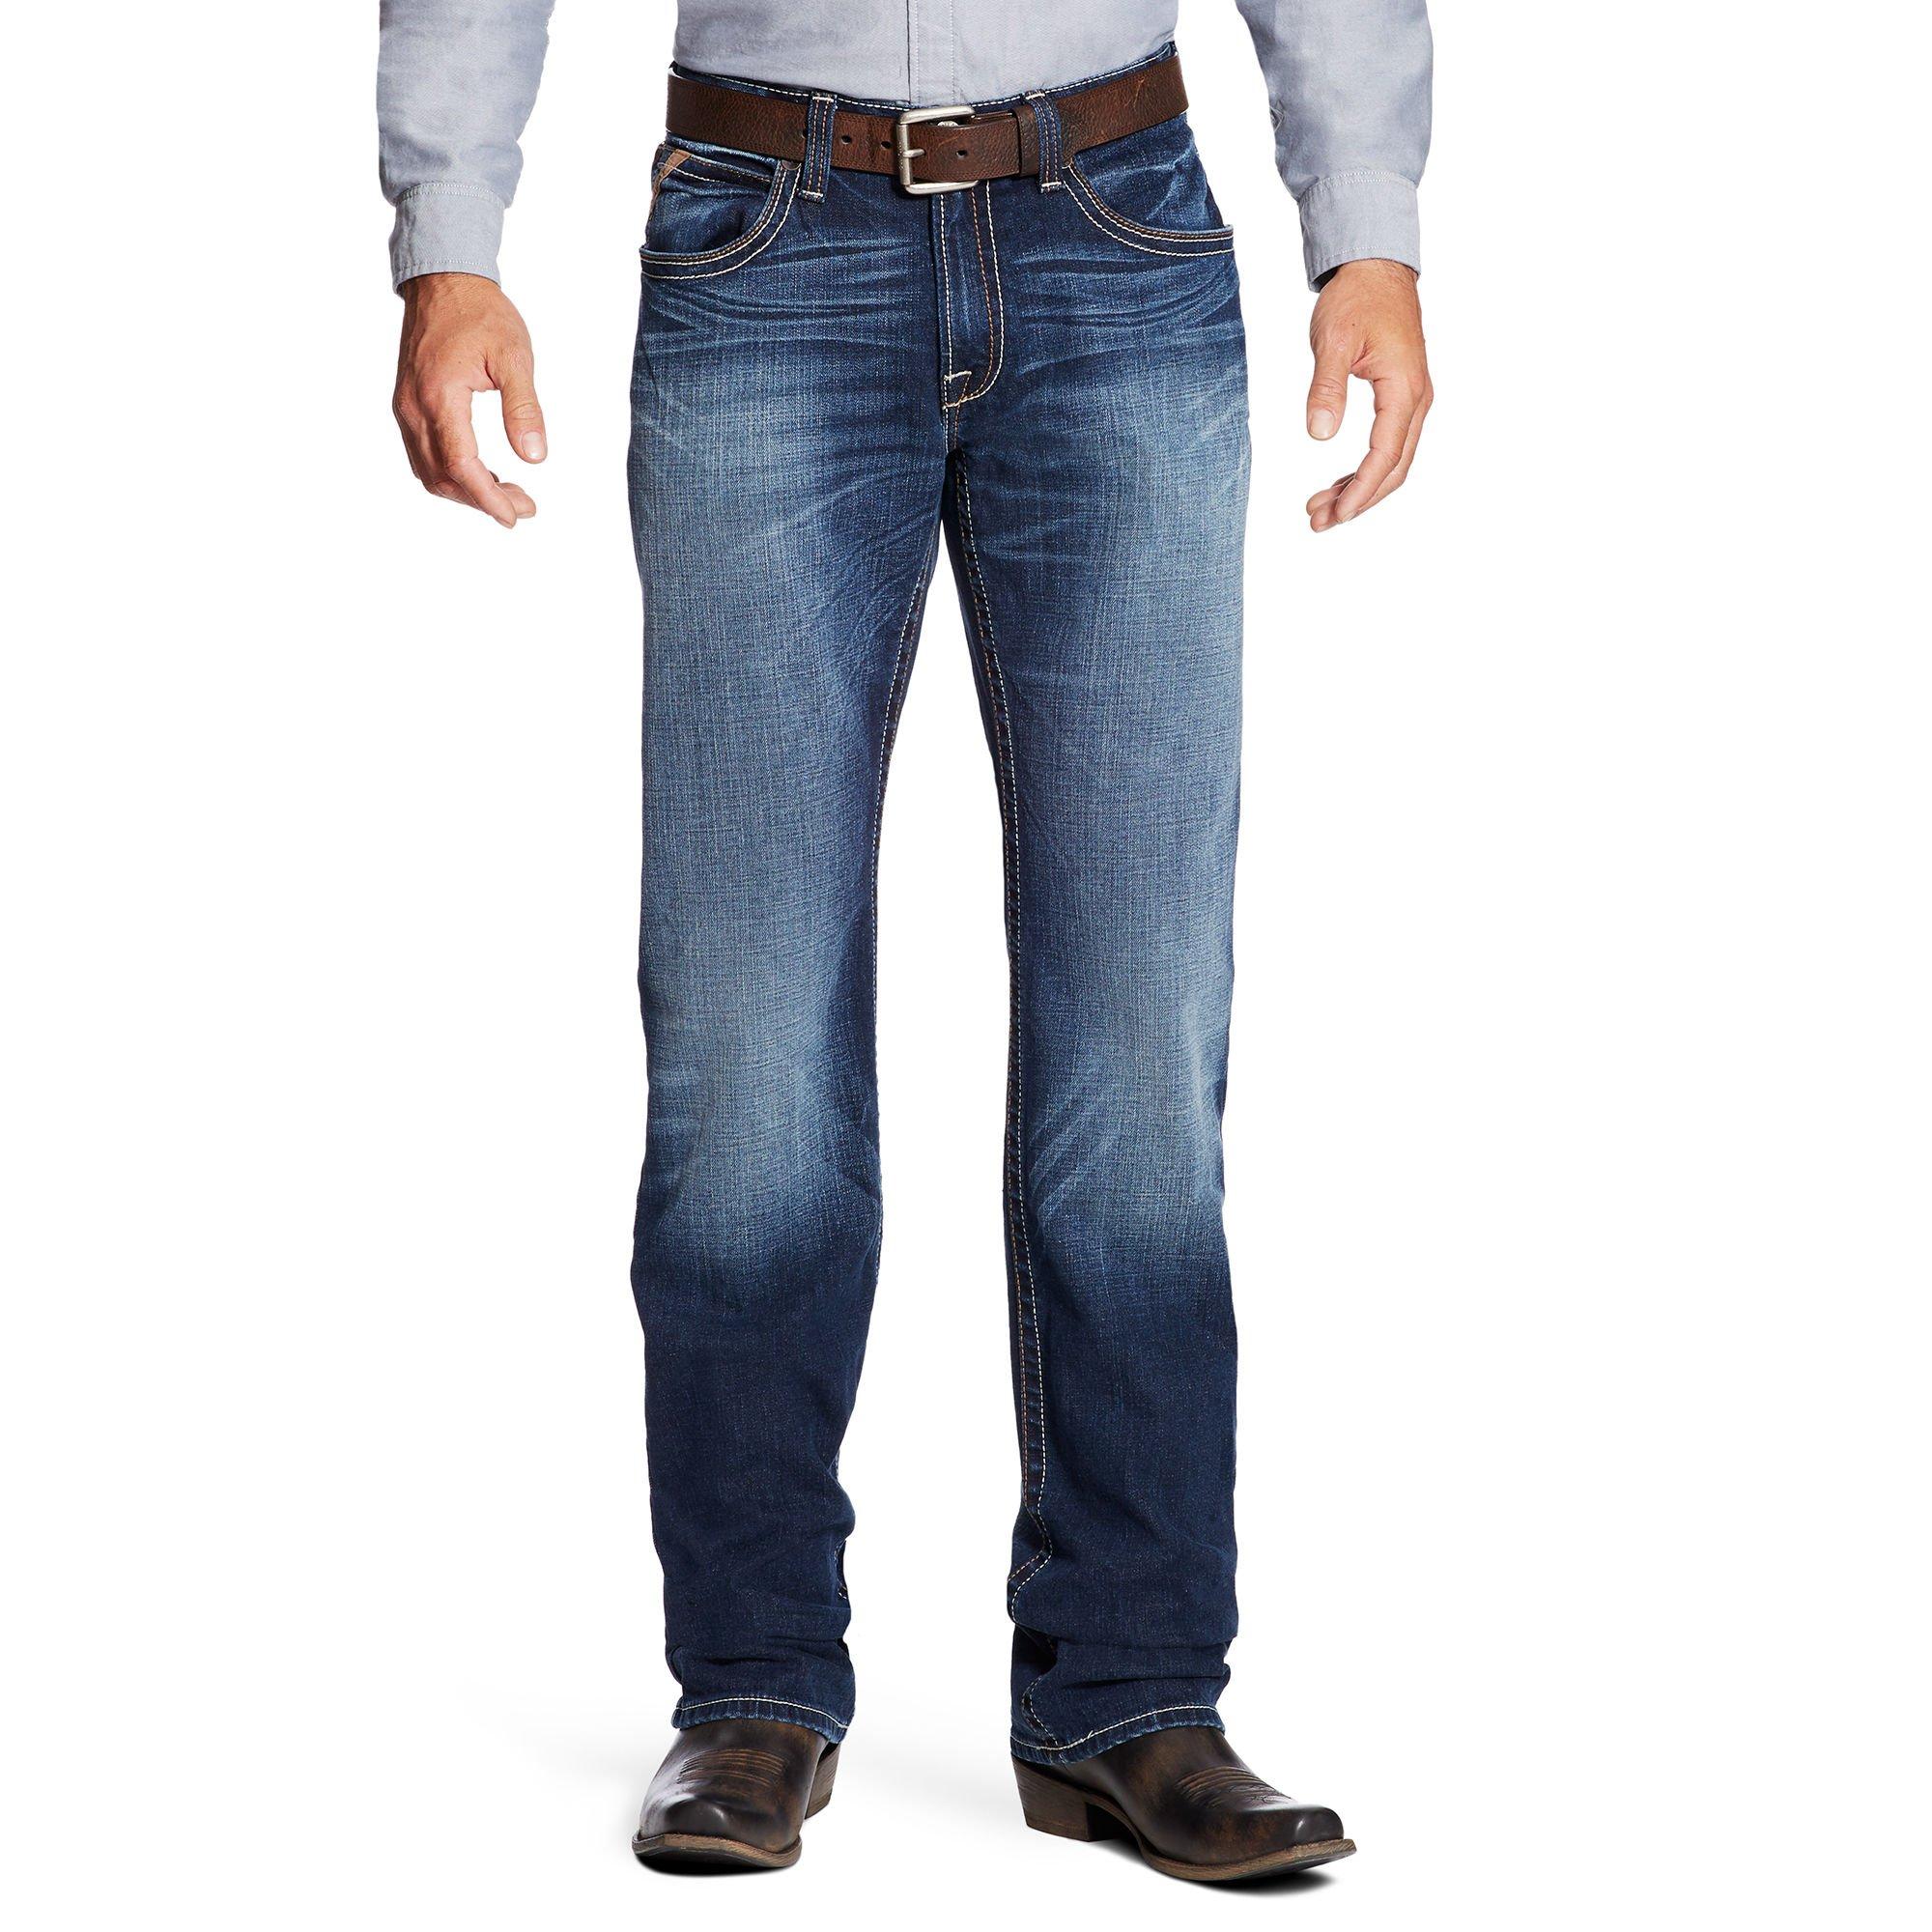 Ariat Men's M4 Low Rise Boot Cut Jean, Cadet, 31W x 38L